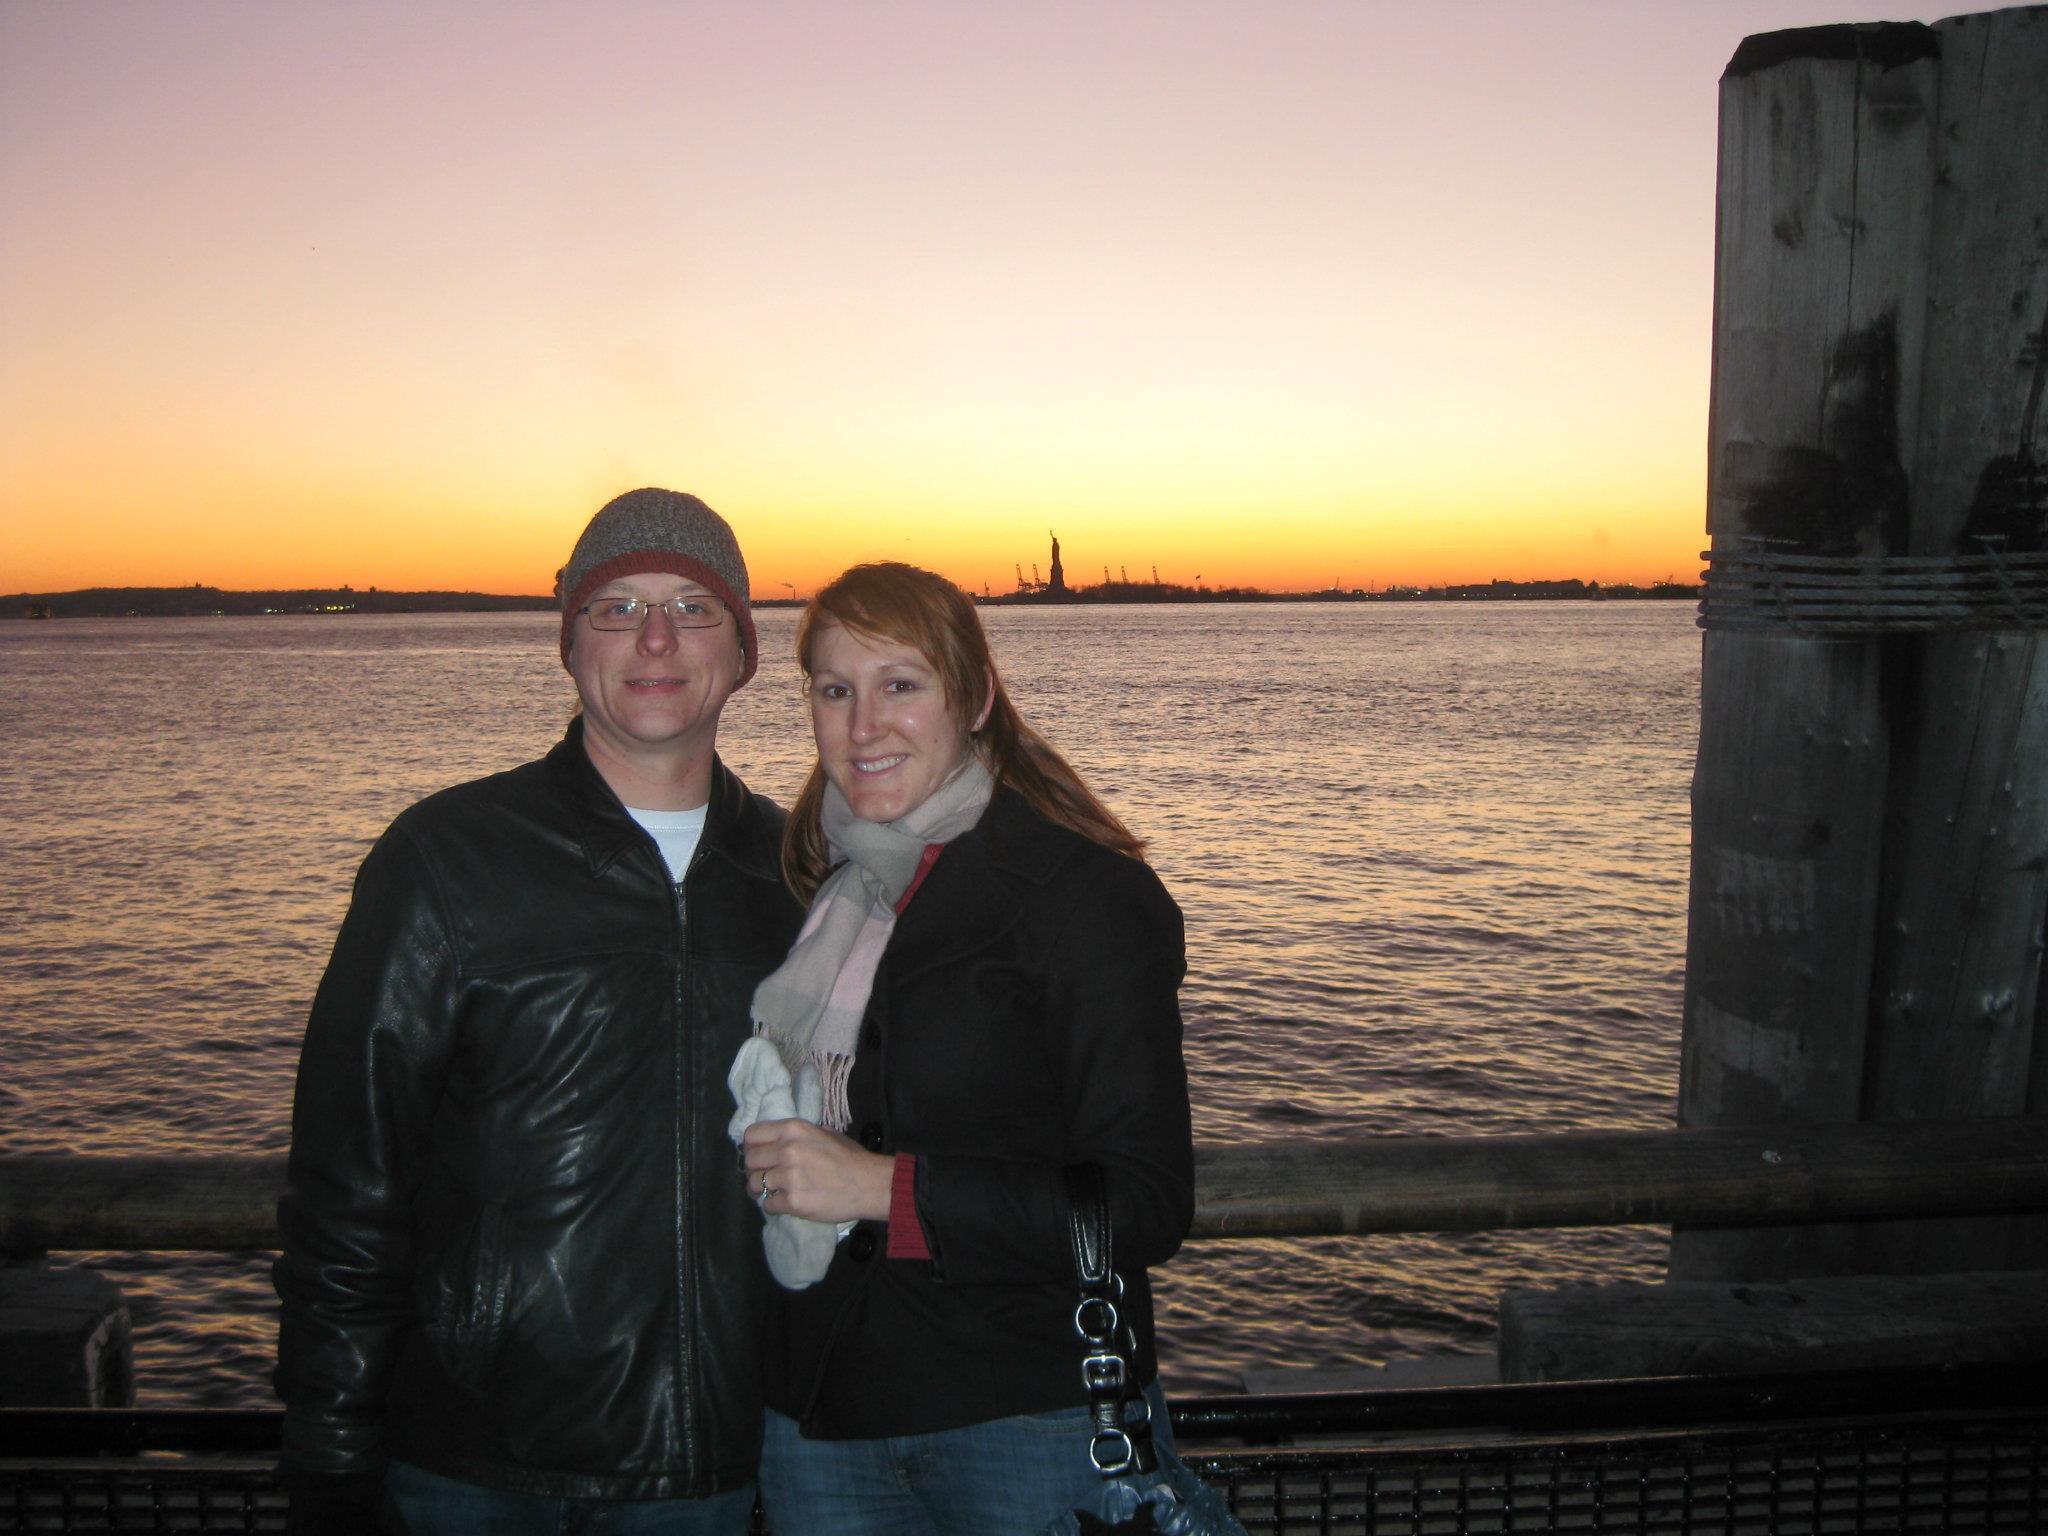 Hodan and Statue of Liberty